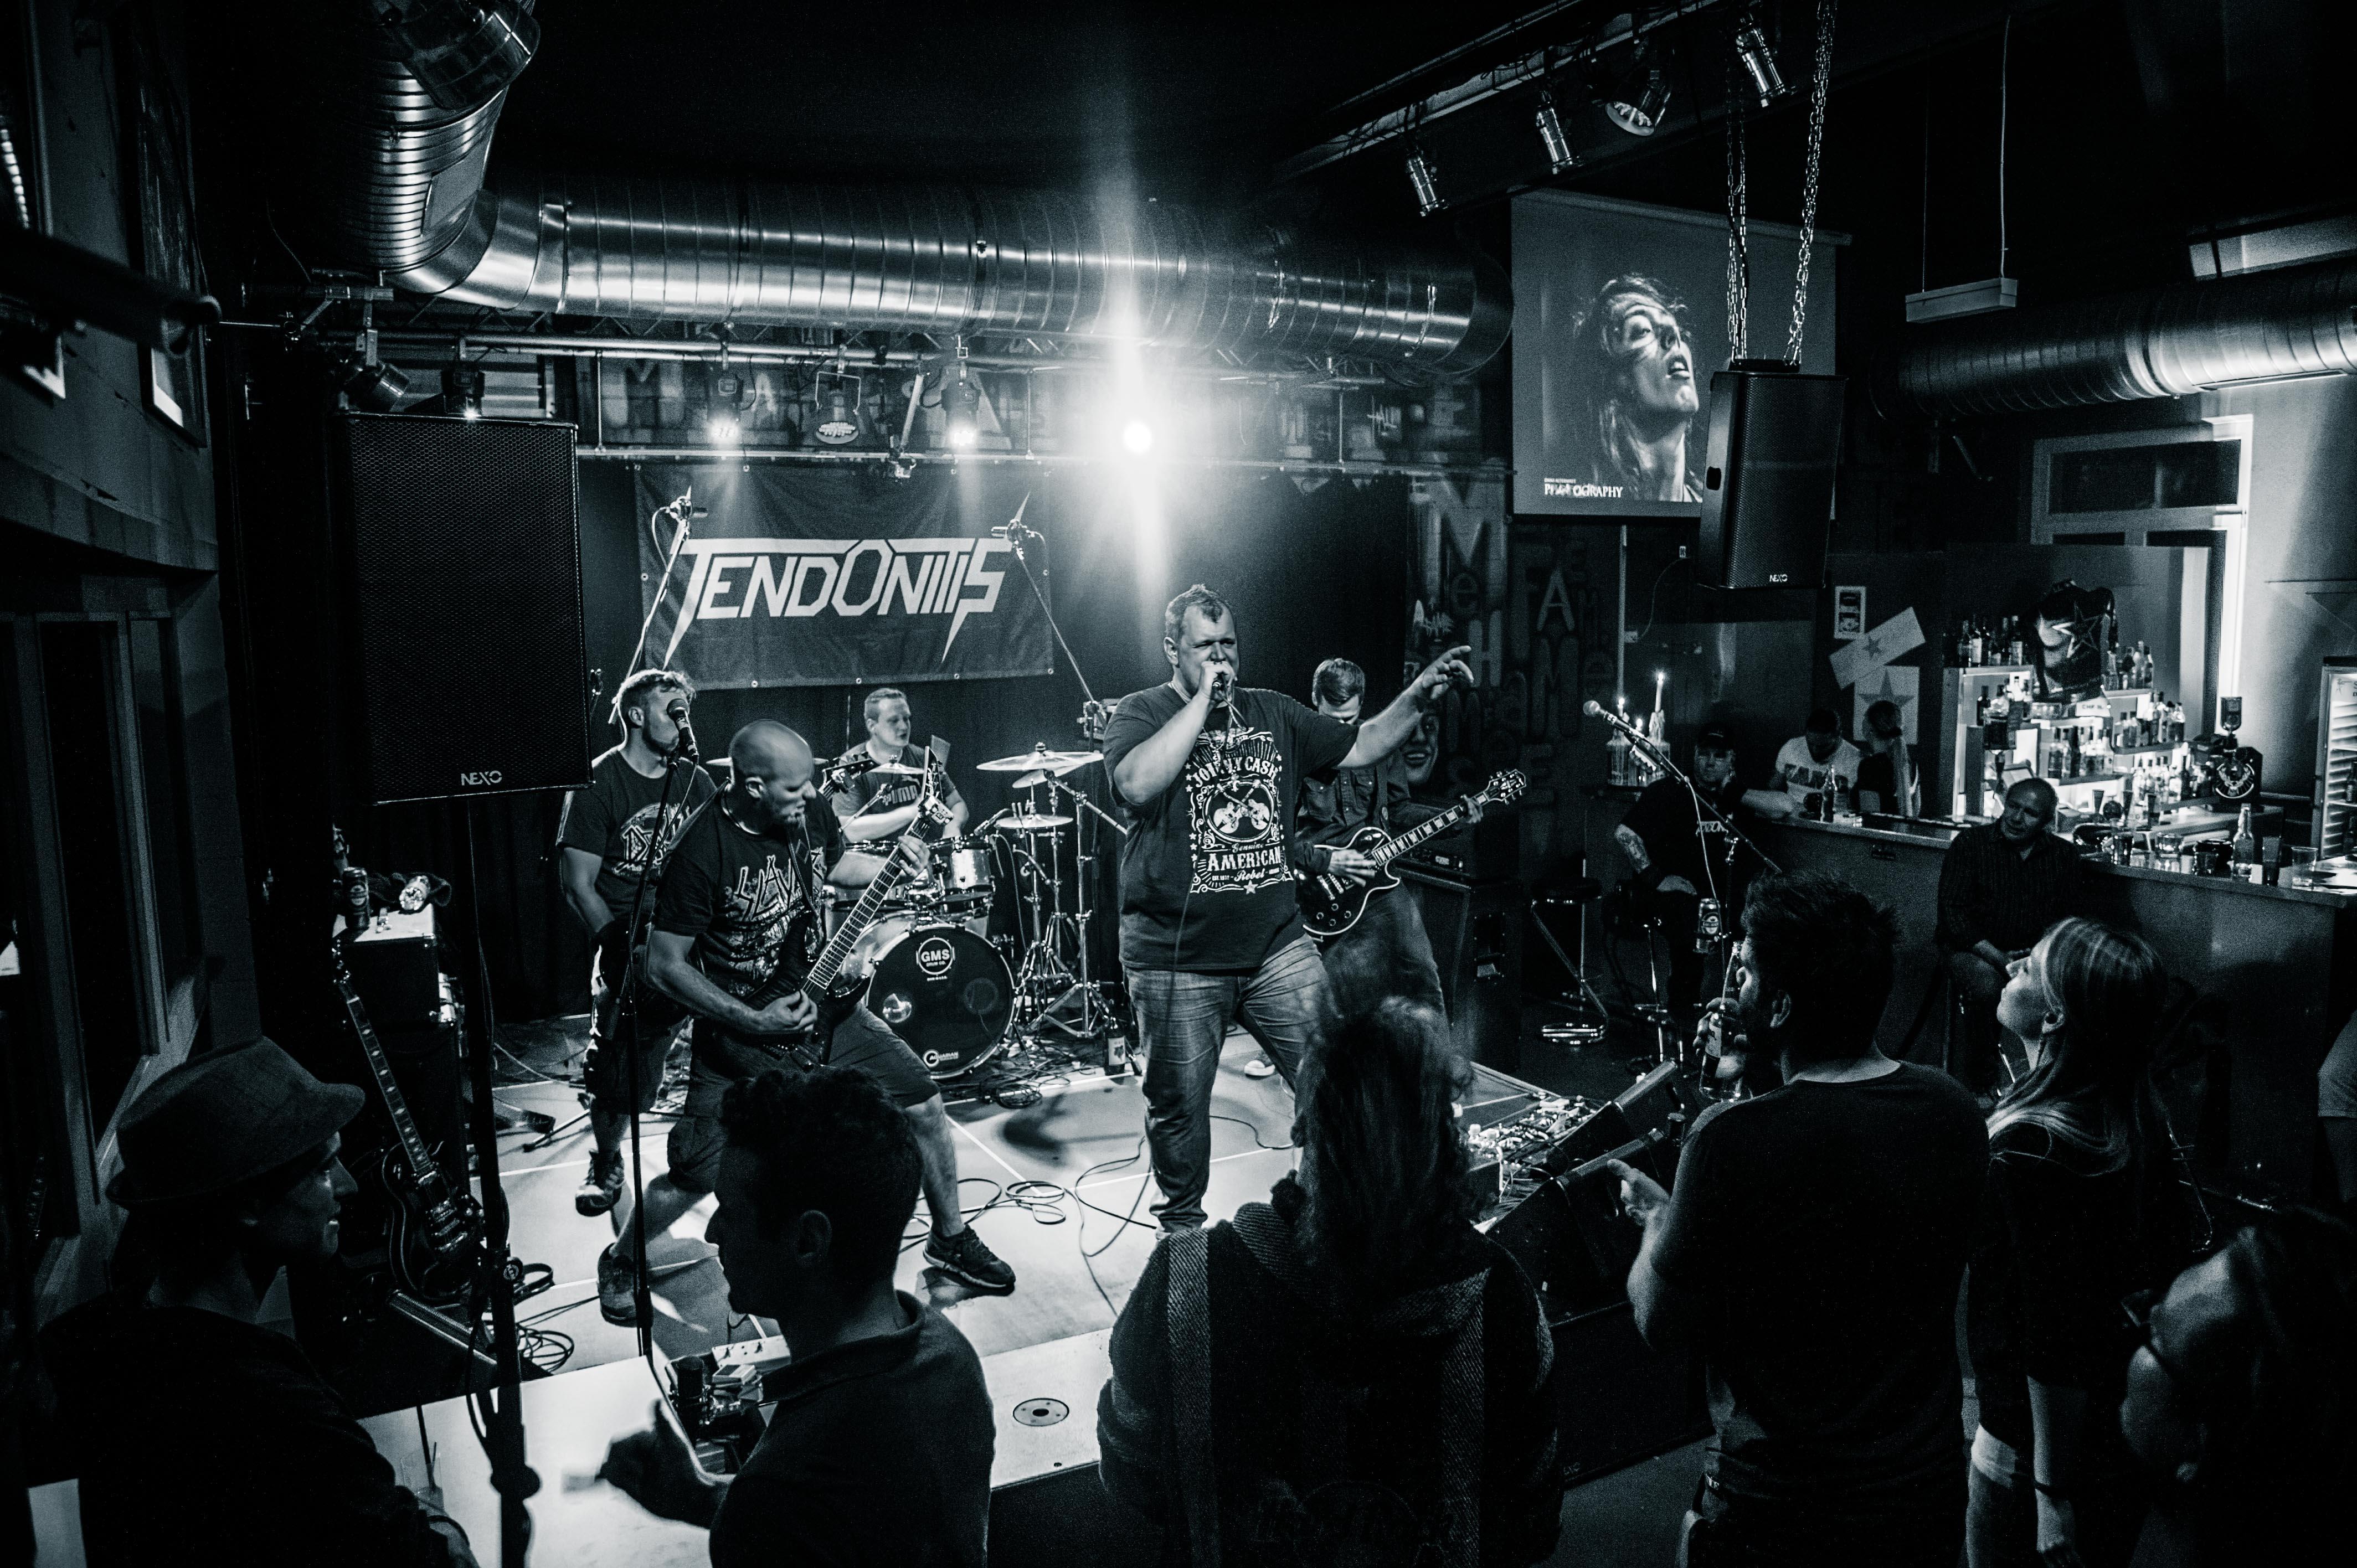 17_04_Tendonitis Fame Wetzikon-88